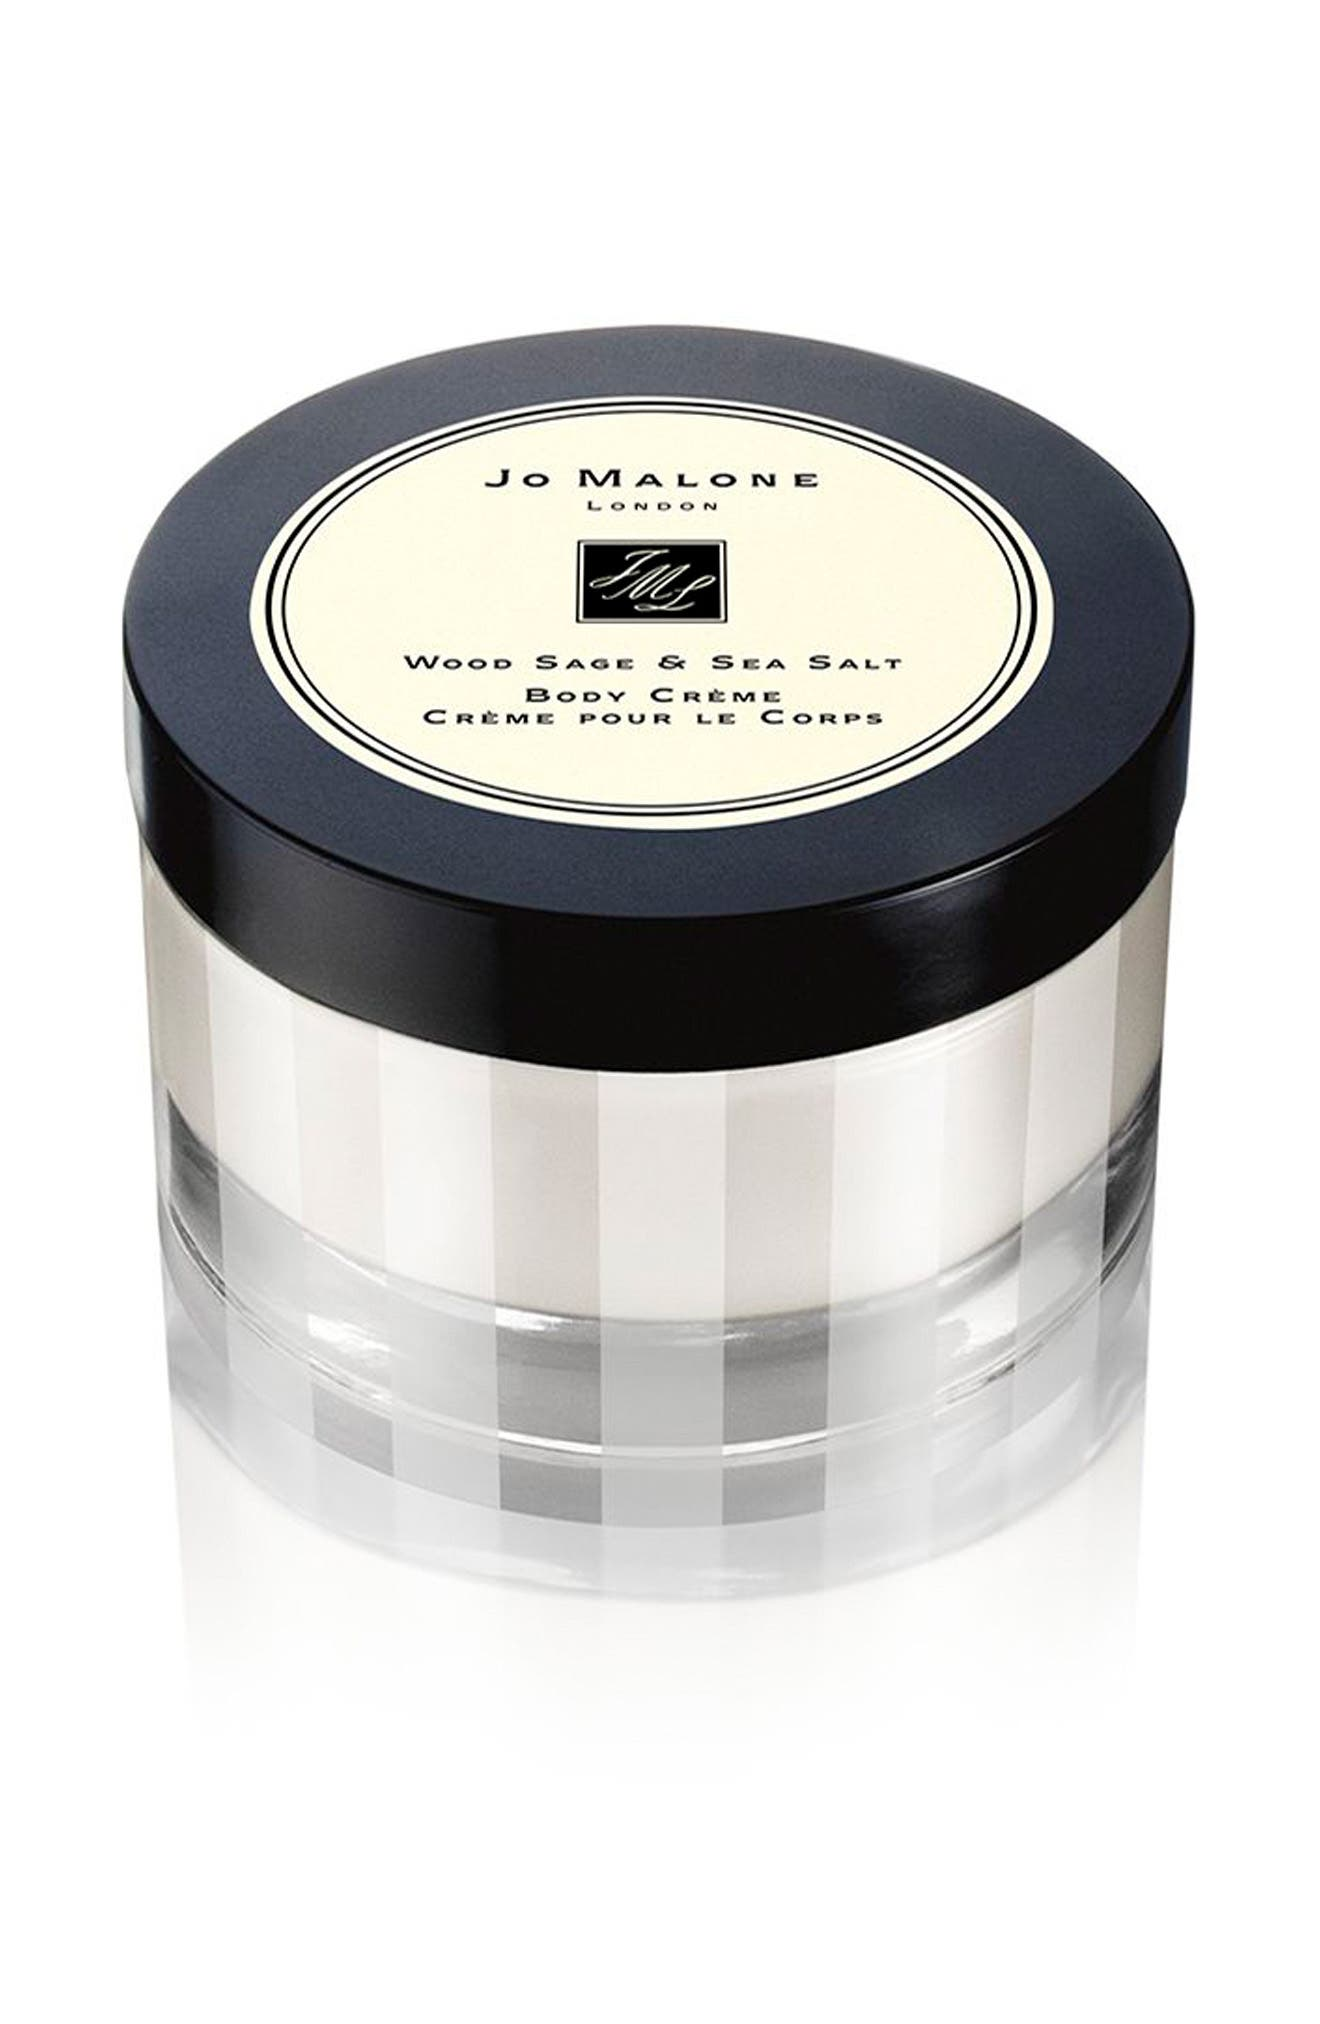 Jo Malone London™ 'Wood Sage & Sea Salt' Body Cream